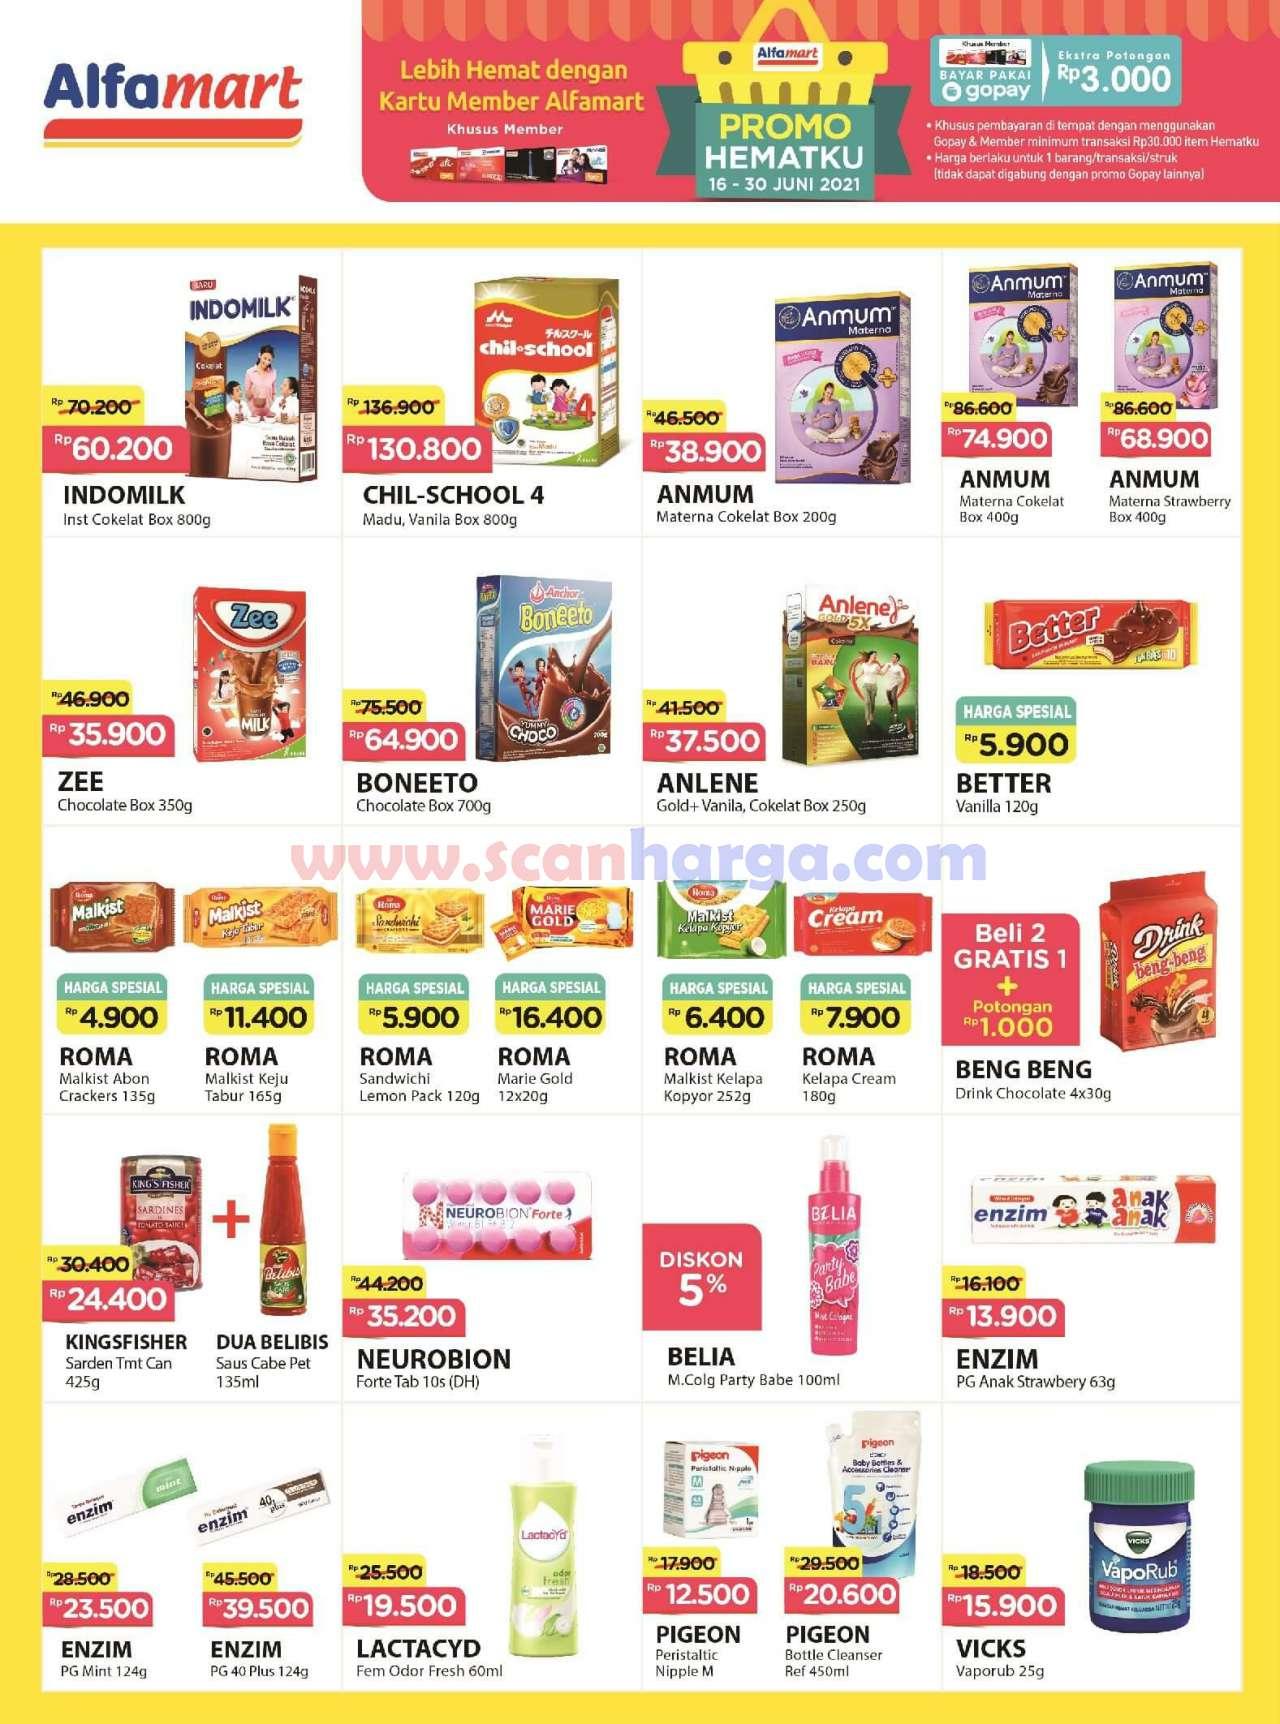 Katalog Promo Alfamart 16 - 30 Juni 2021 20